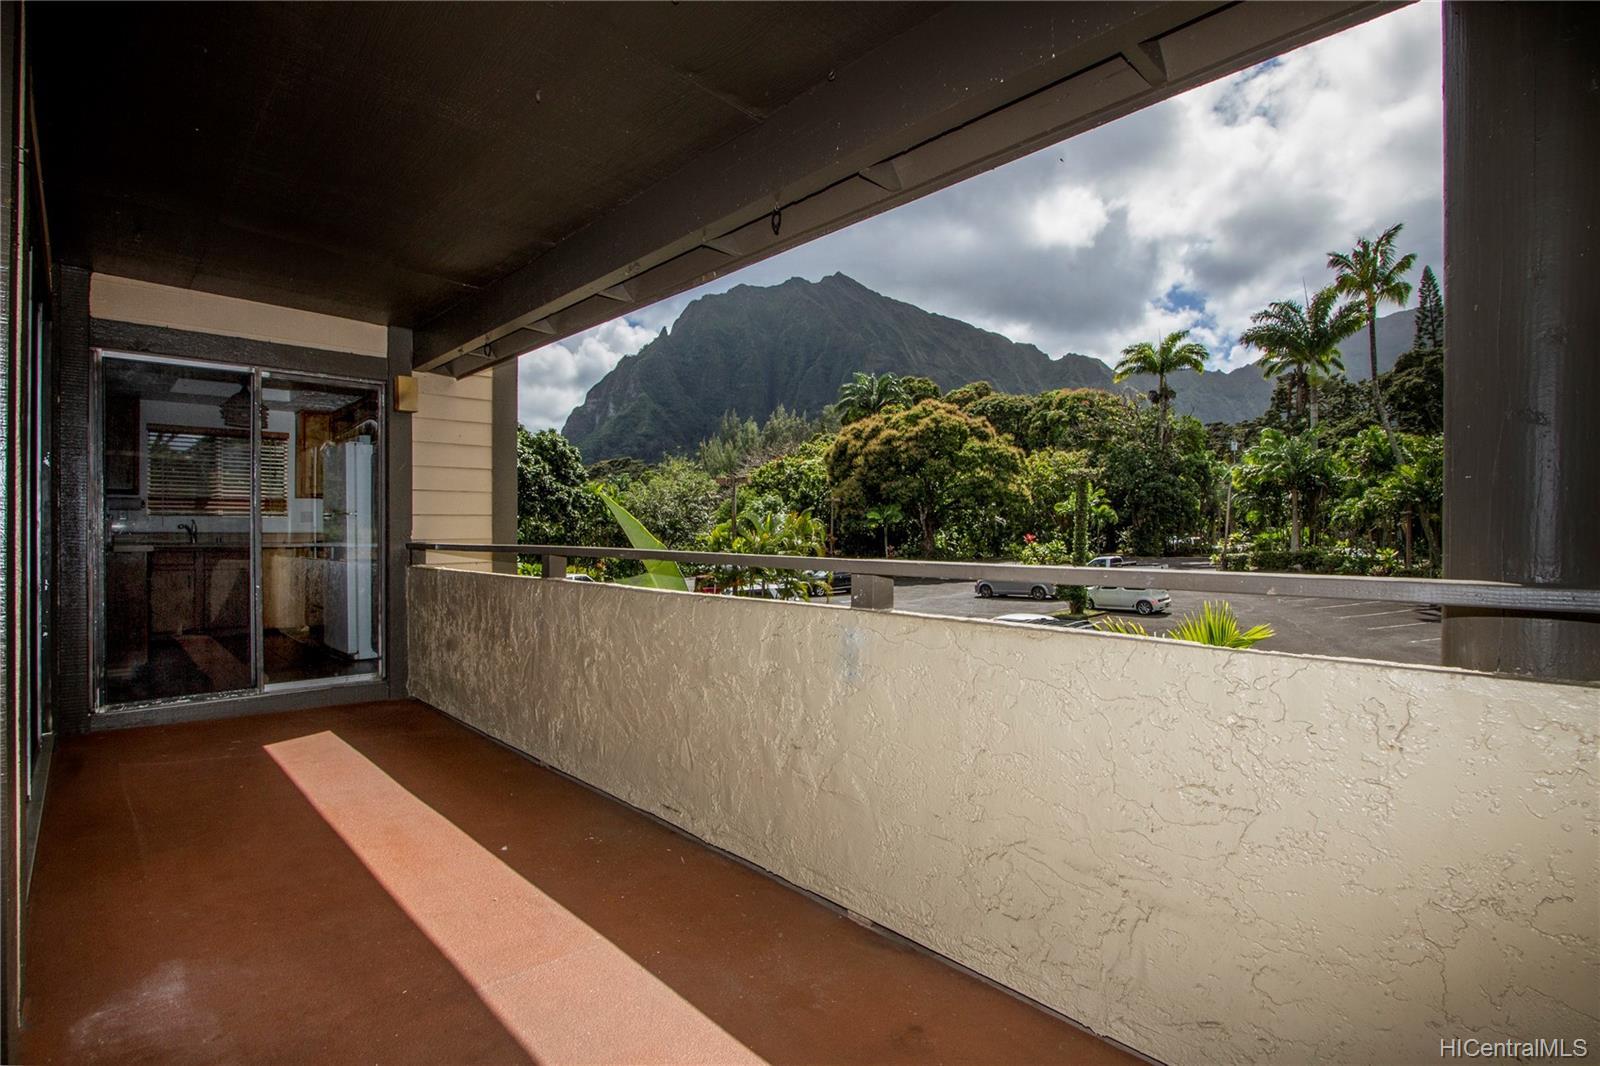 46-324 Haiku Road townhouse # 106, Kaneohe, Hawaii - photo 5 of 24